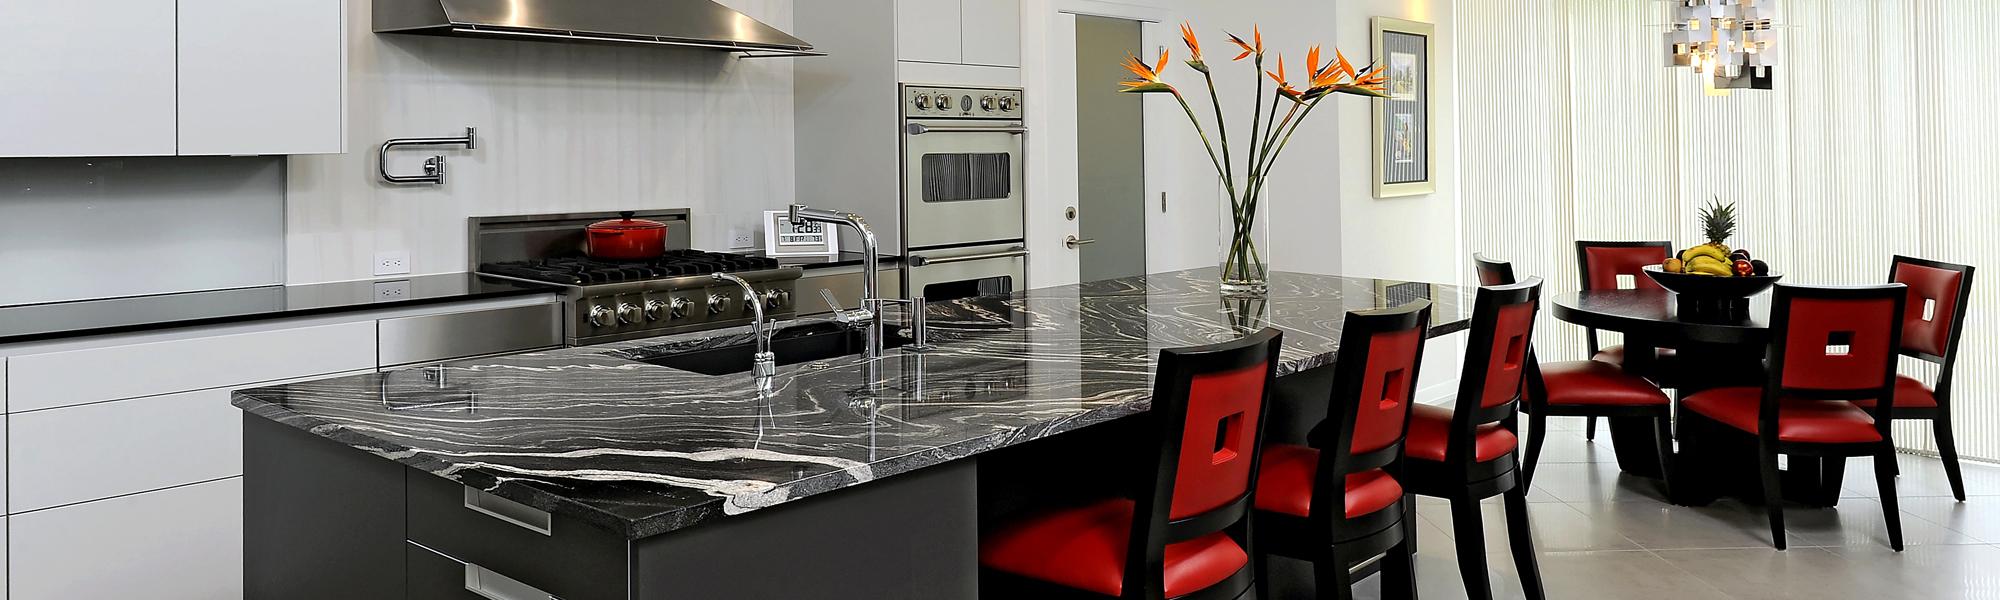 McLean Contemporary Kitchen Renovation